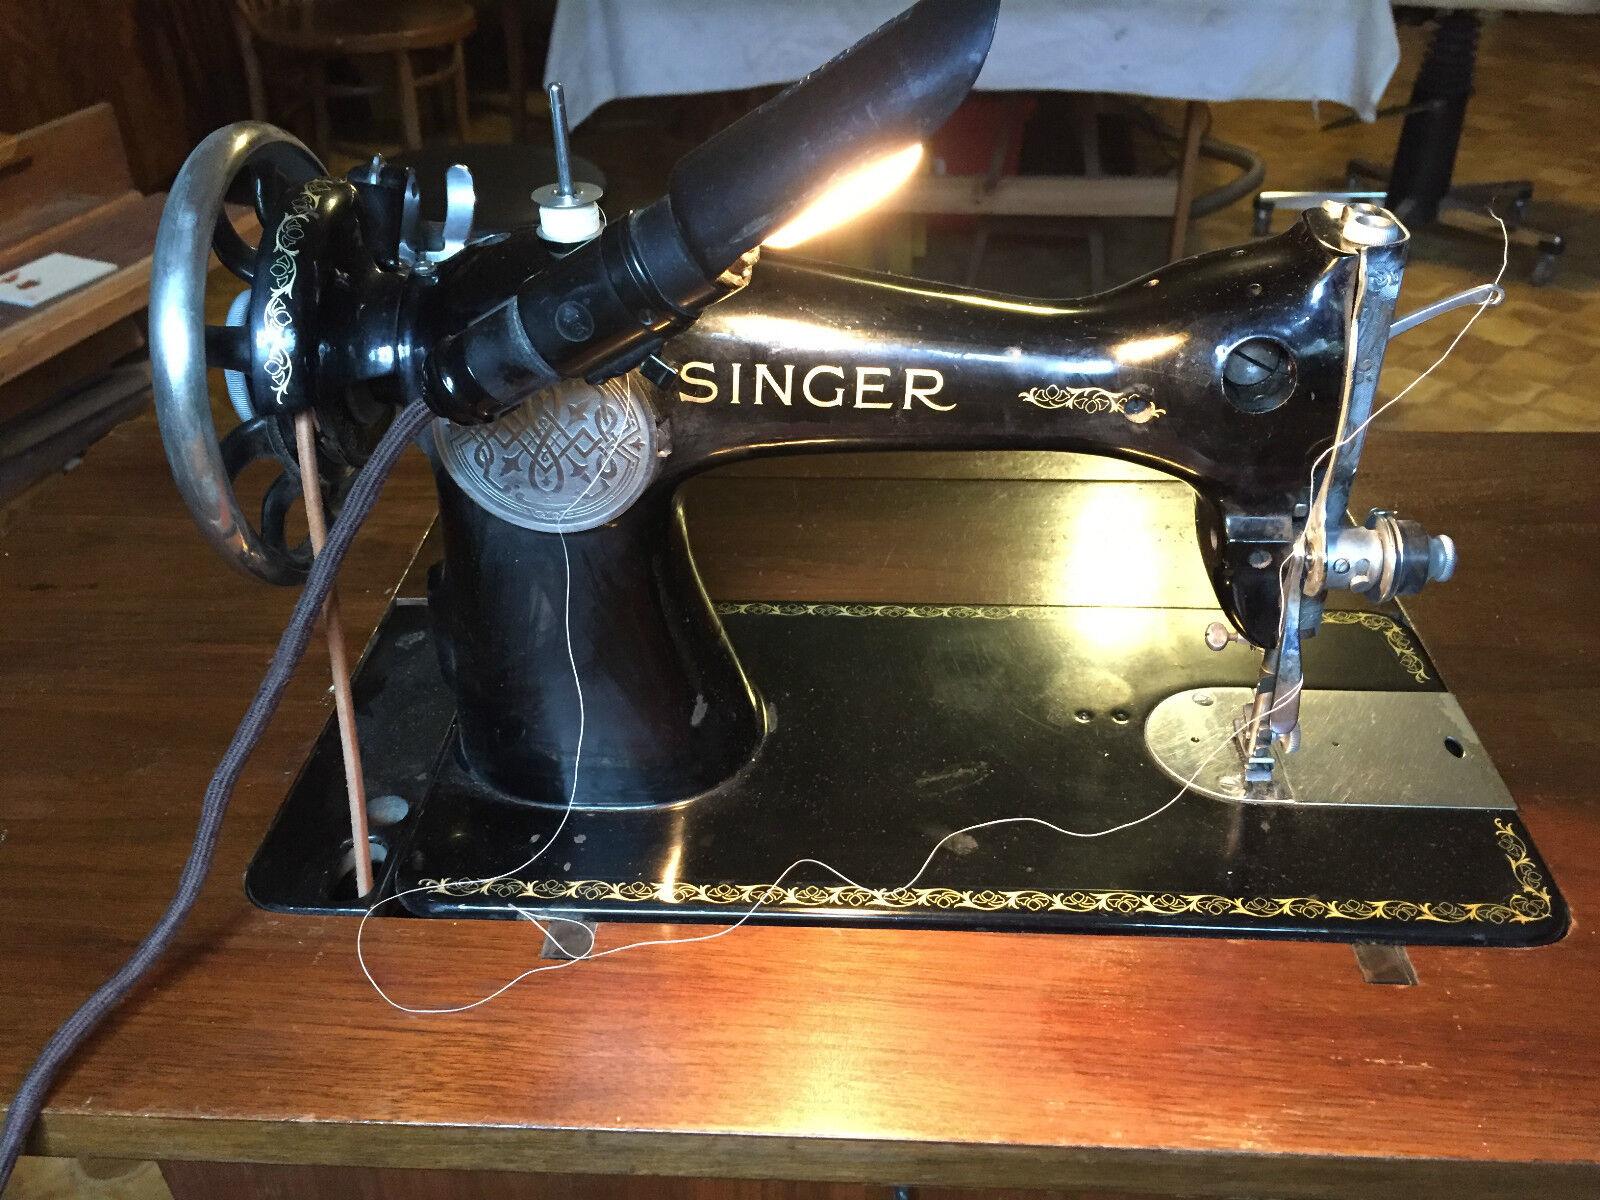 vintage singer n hmaschine antik baujahr original rechnung. Black Bedroom Furniture Sets. Home Design Ideas